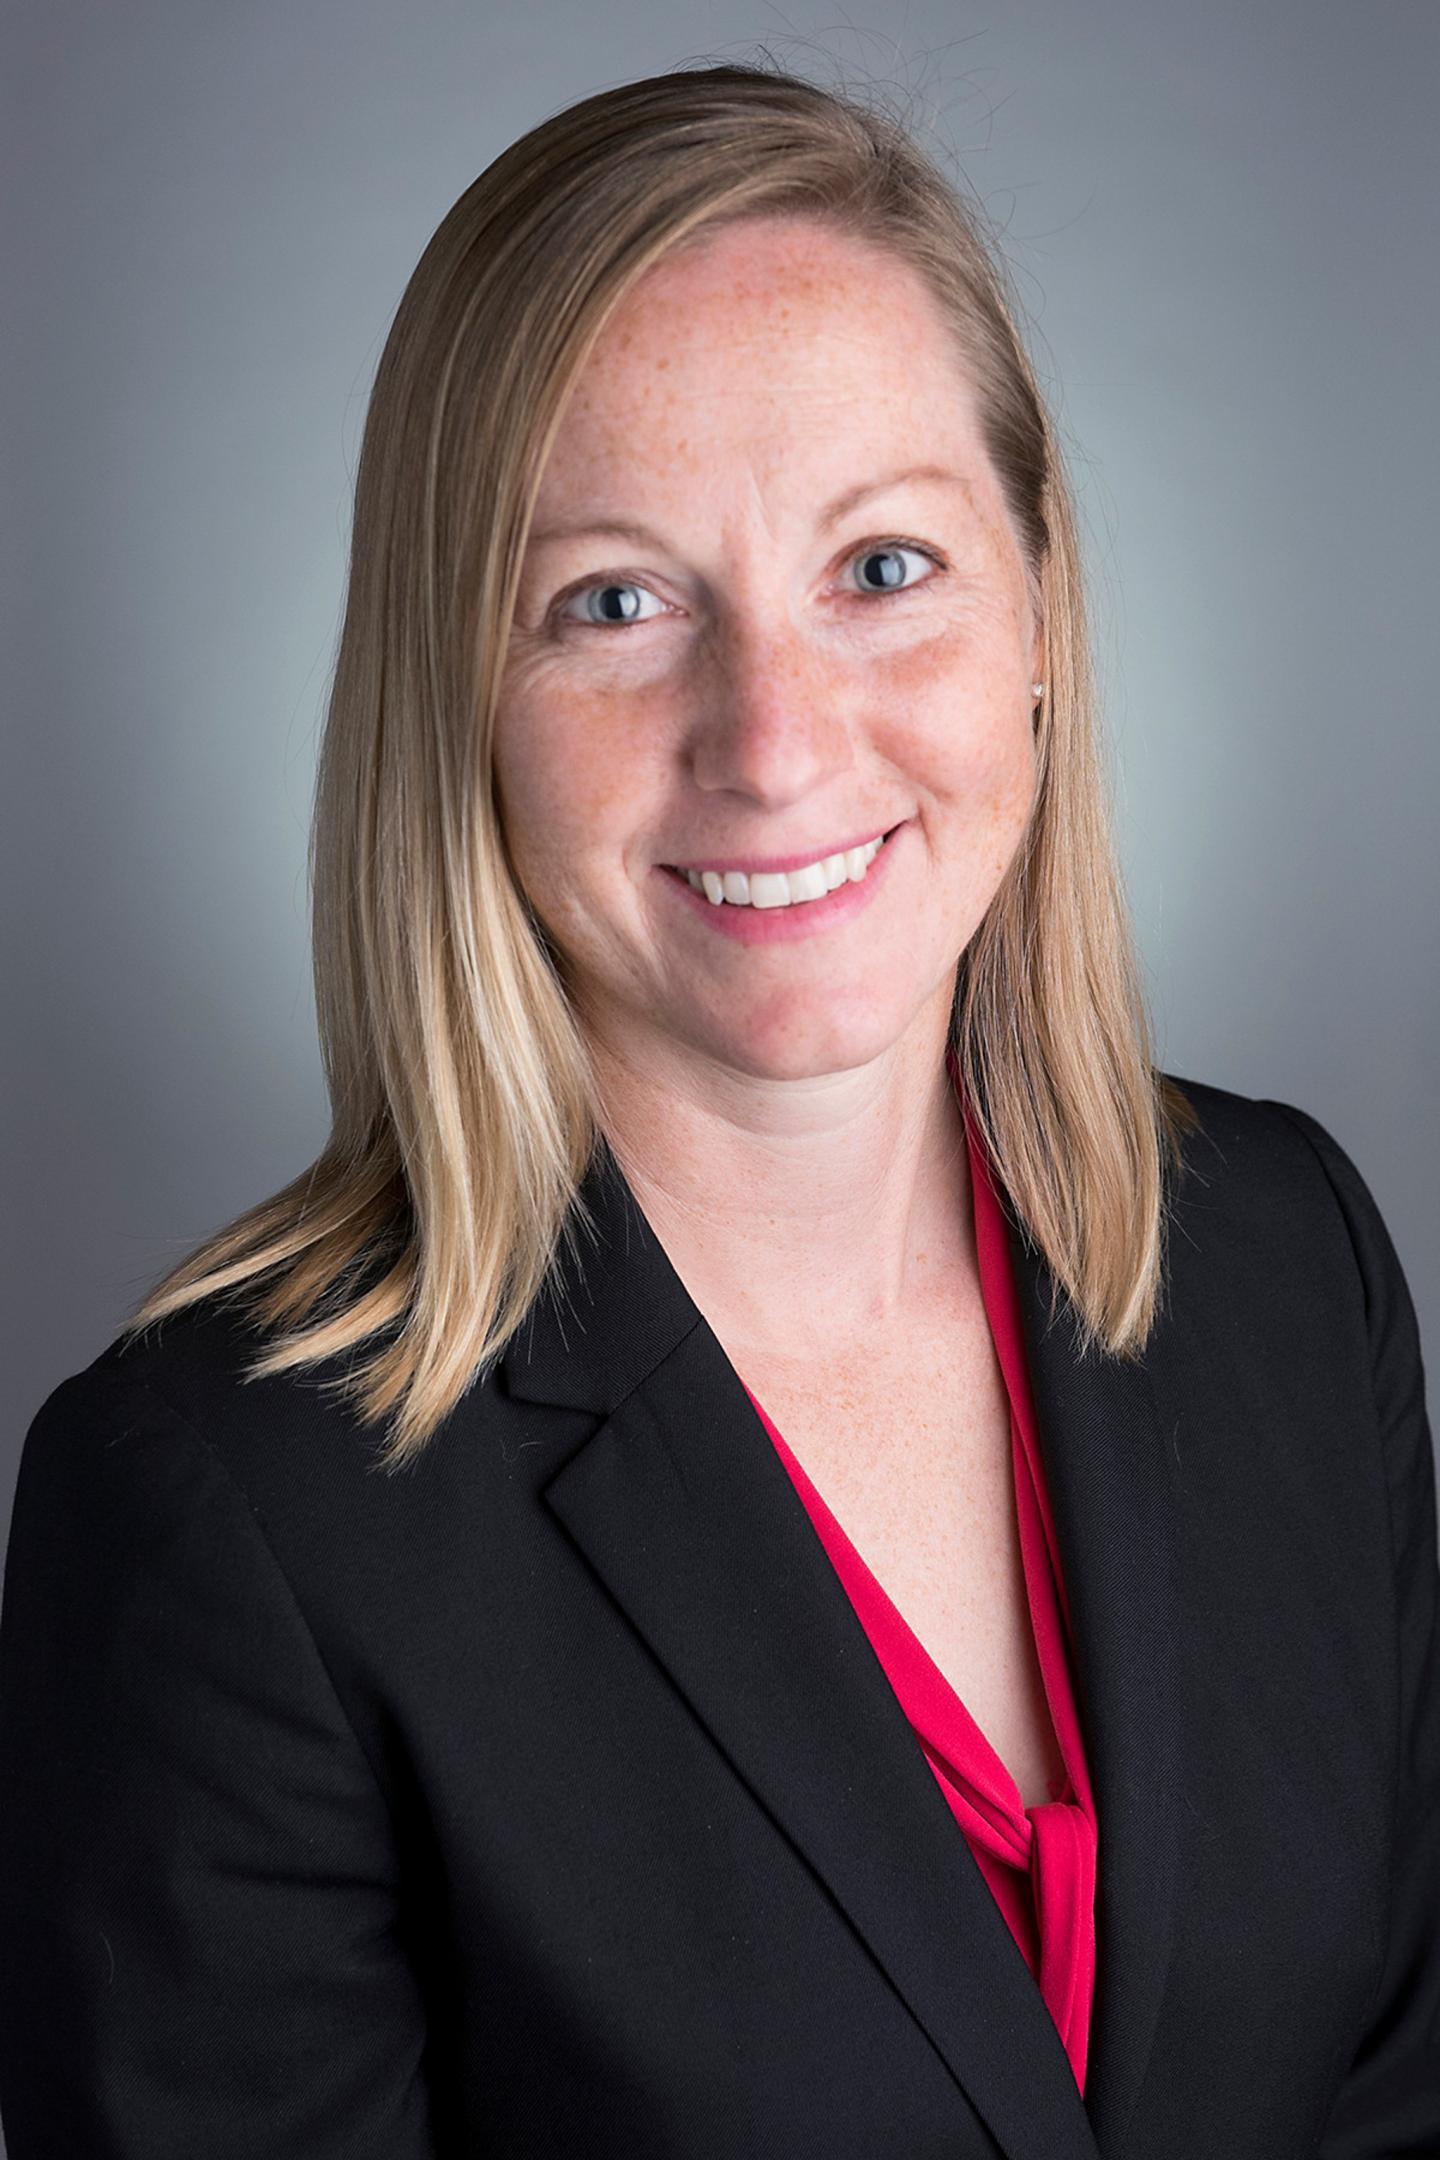 Karen Woody, Indiana University